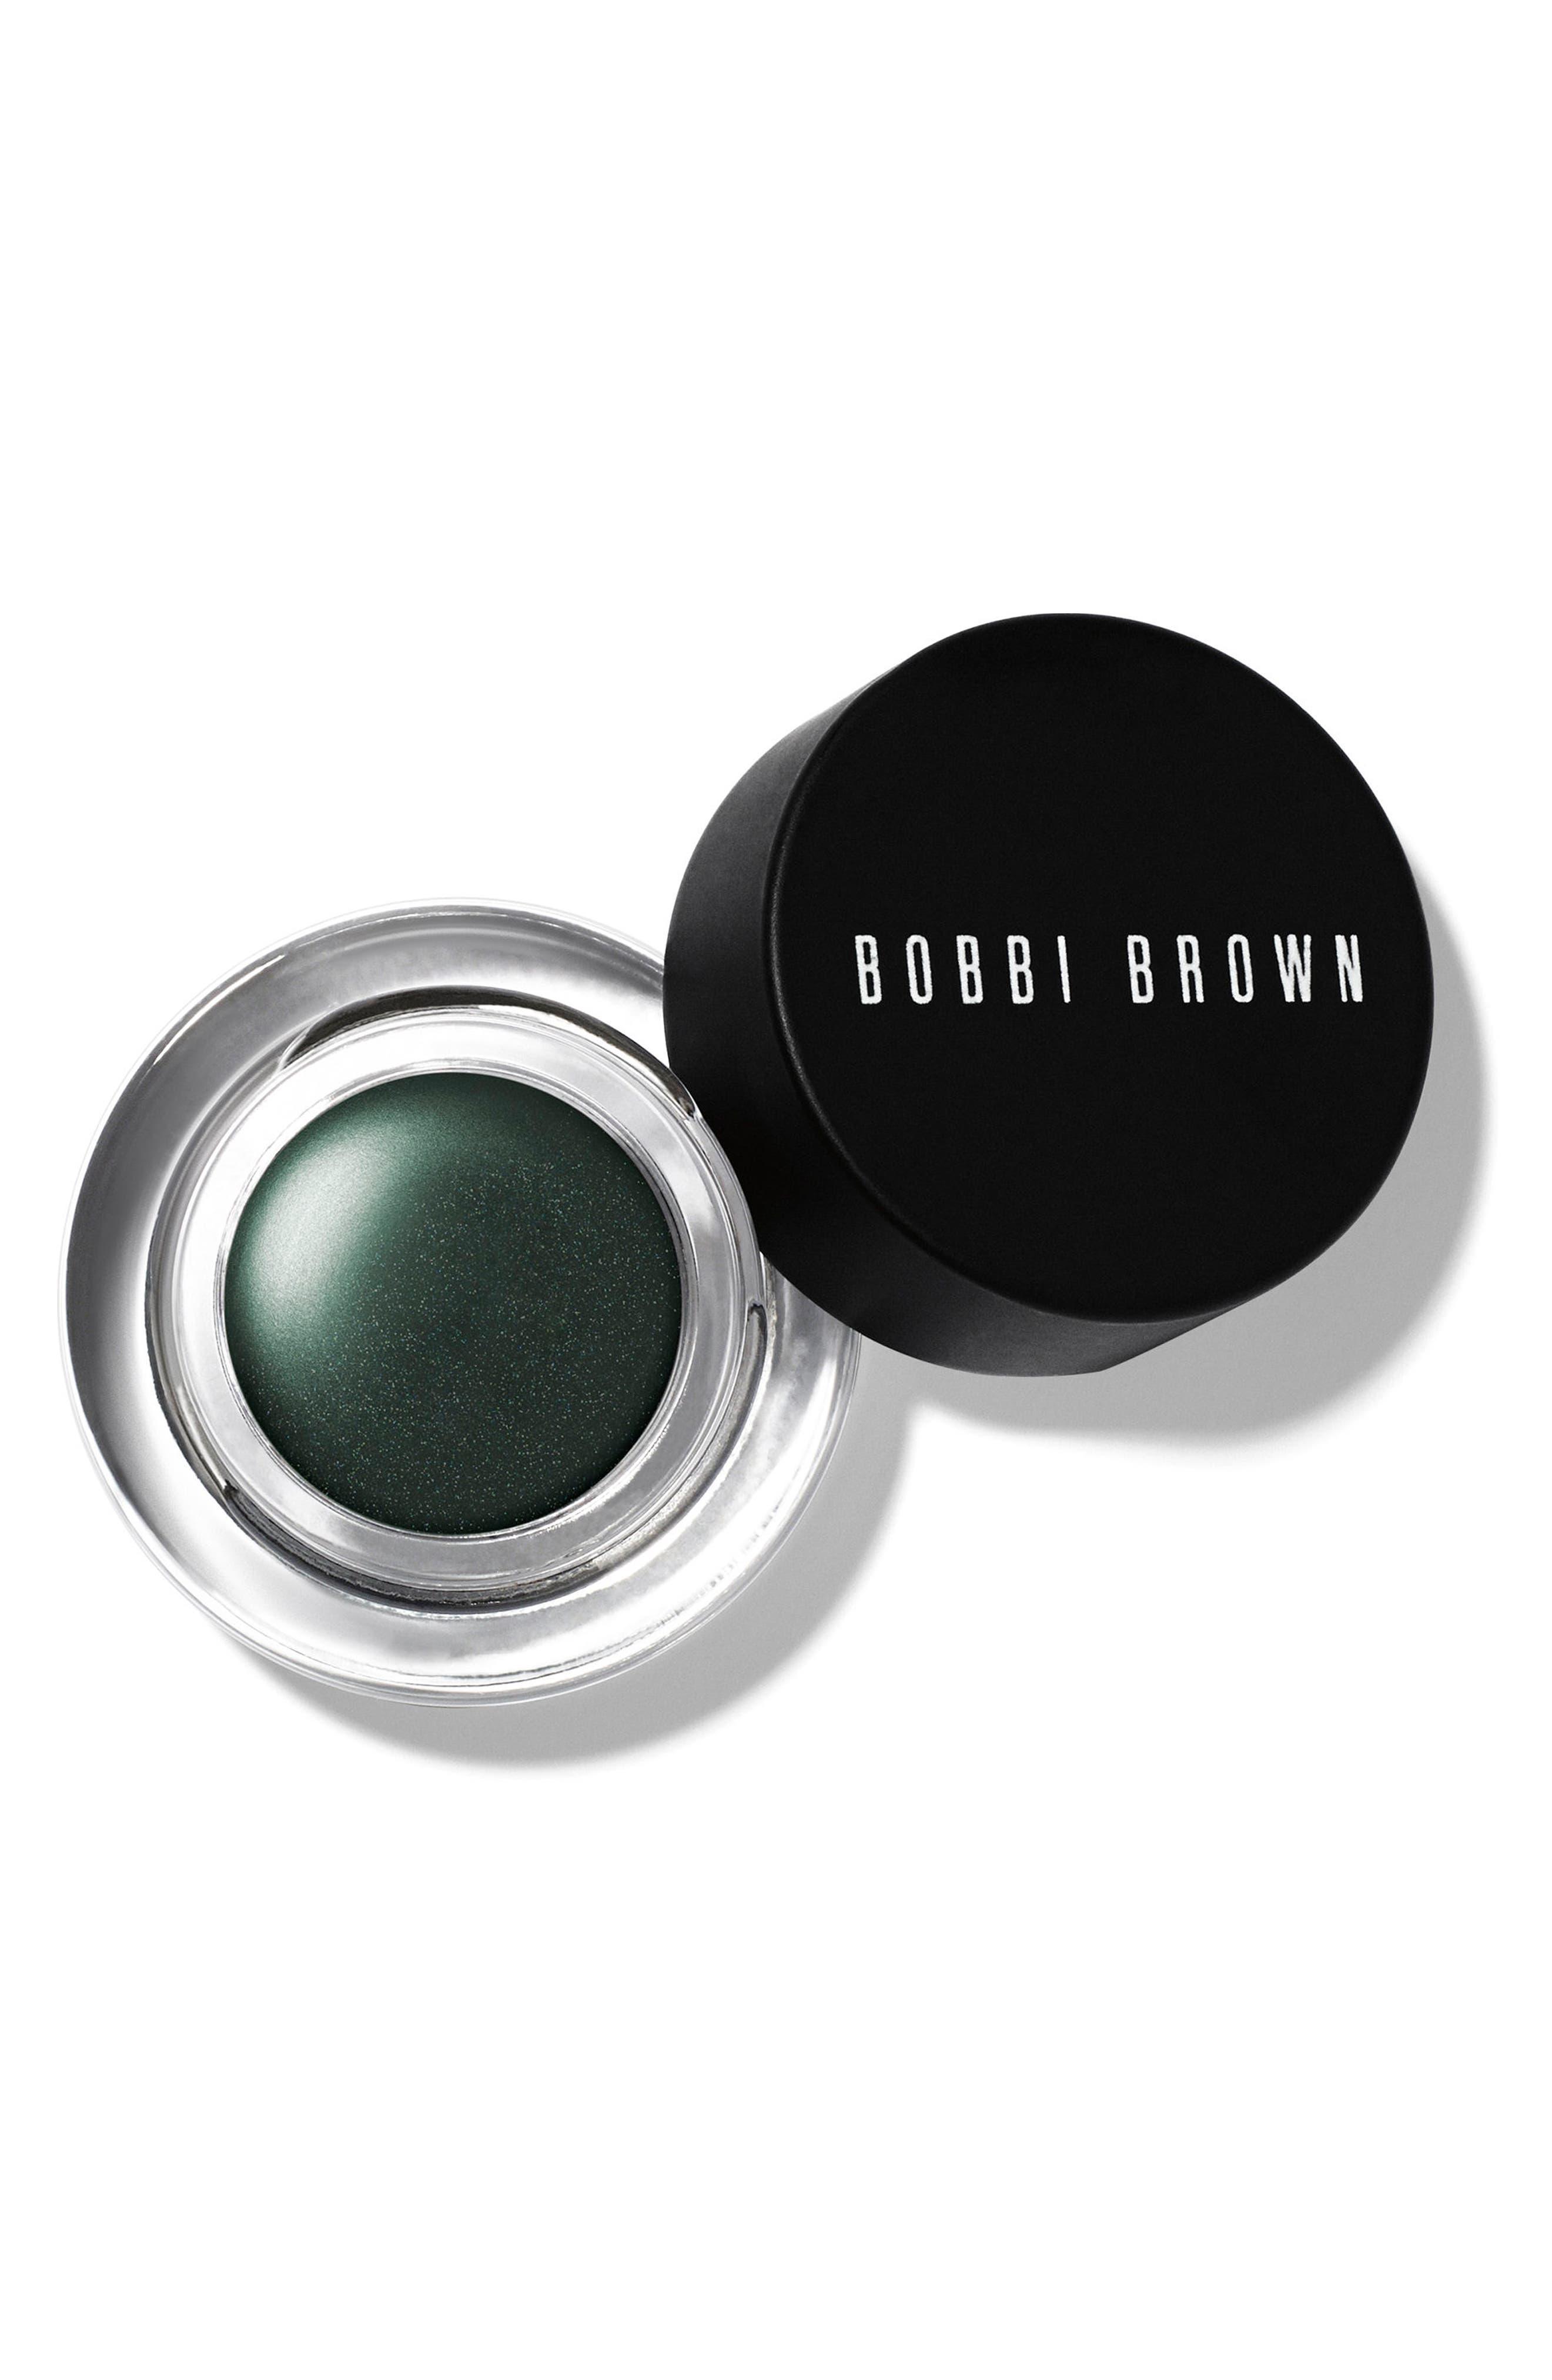 Alternate Image 1 Selected - Bobbi Brown Long-Wear Gel Eyeliner